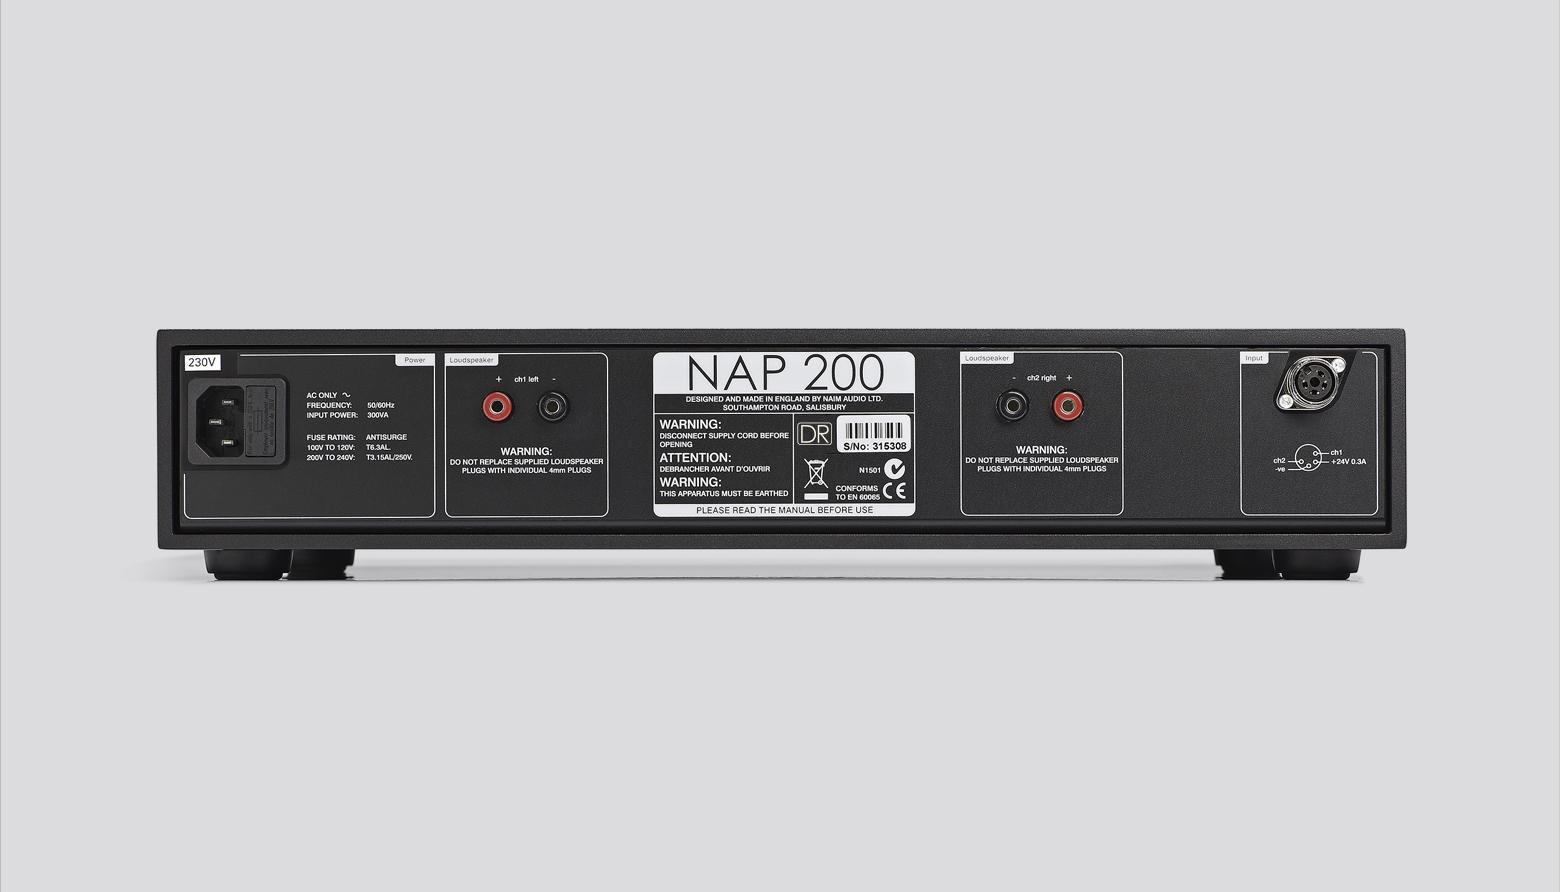 NAP 200 Power Amplifier - Rear View